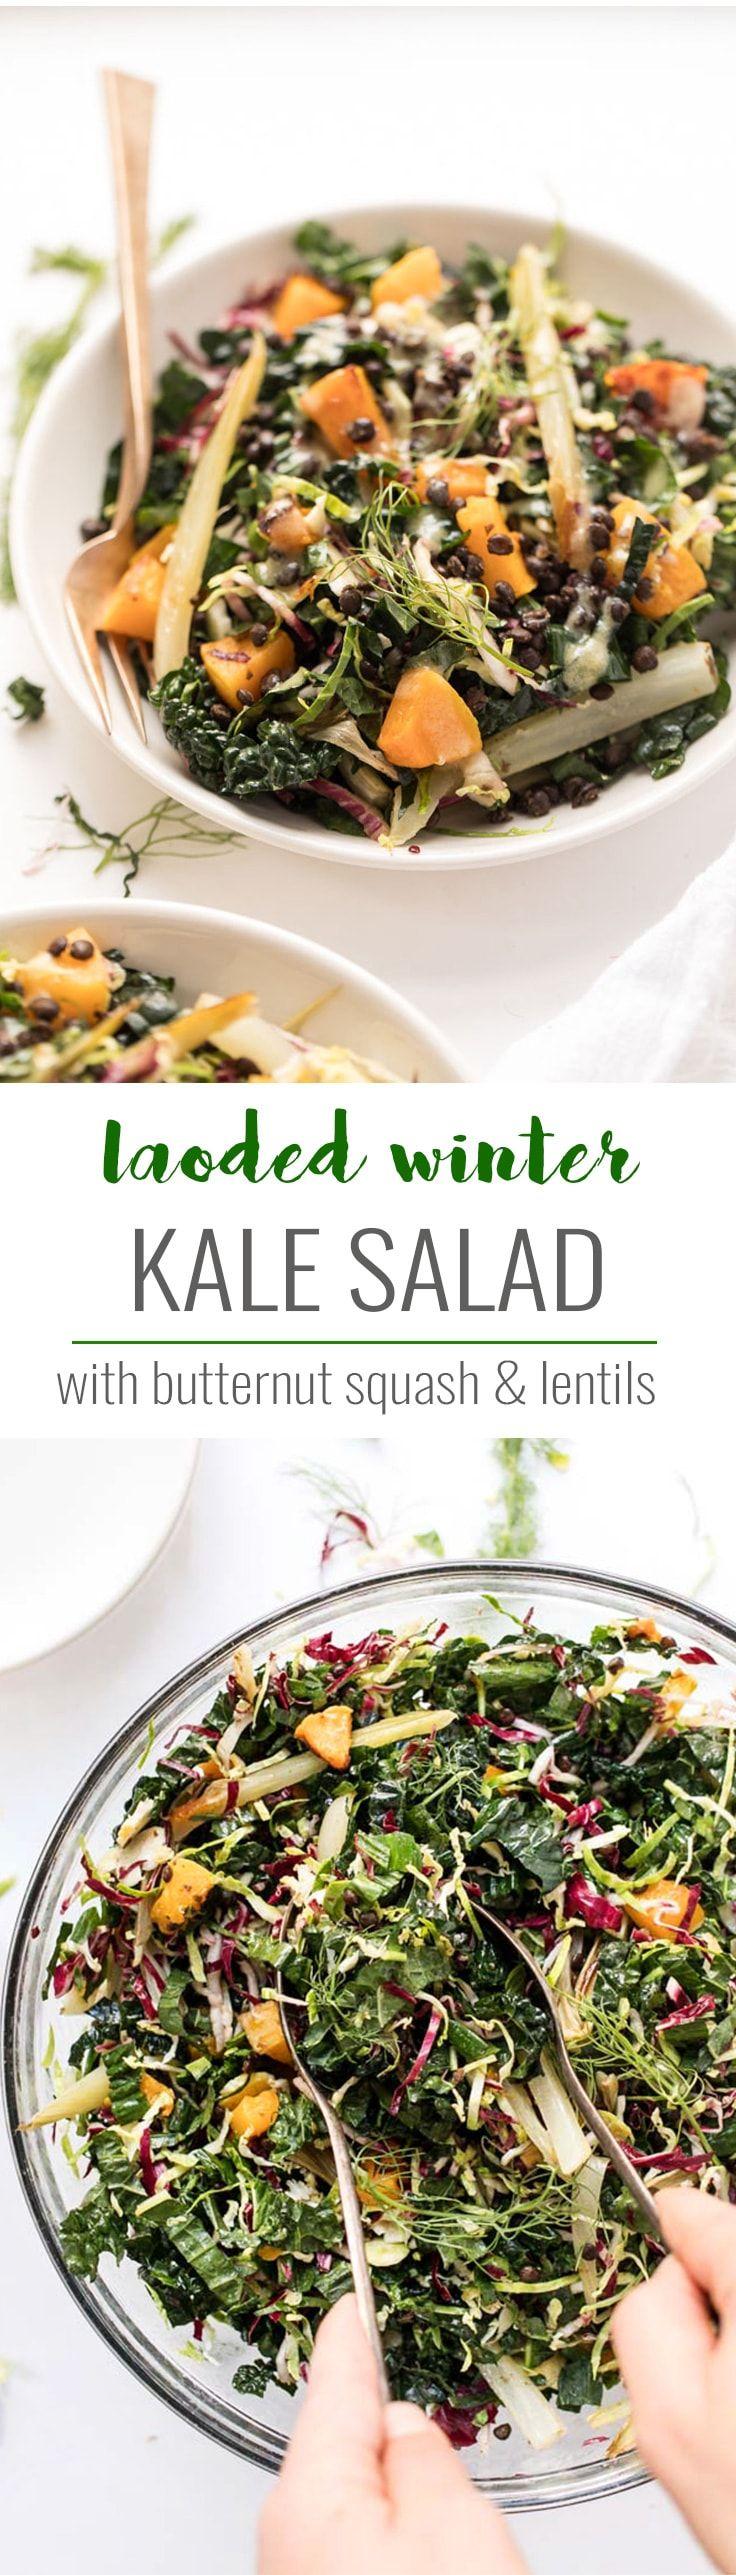 978 best Salad Sensations images on Pinterest | Arugula goat cheese ...